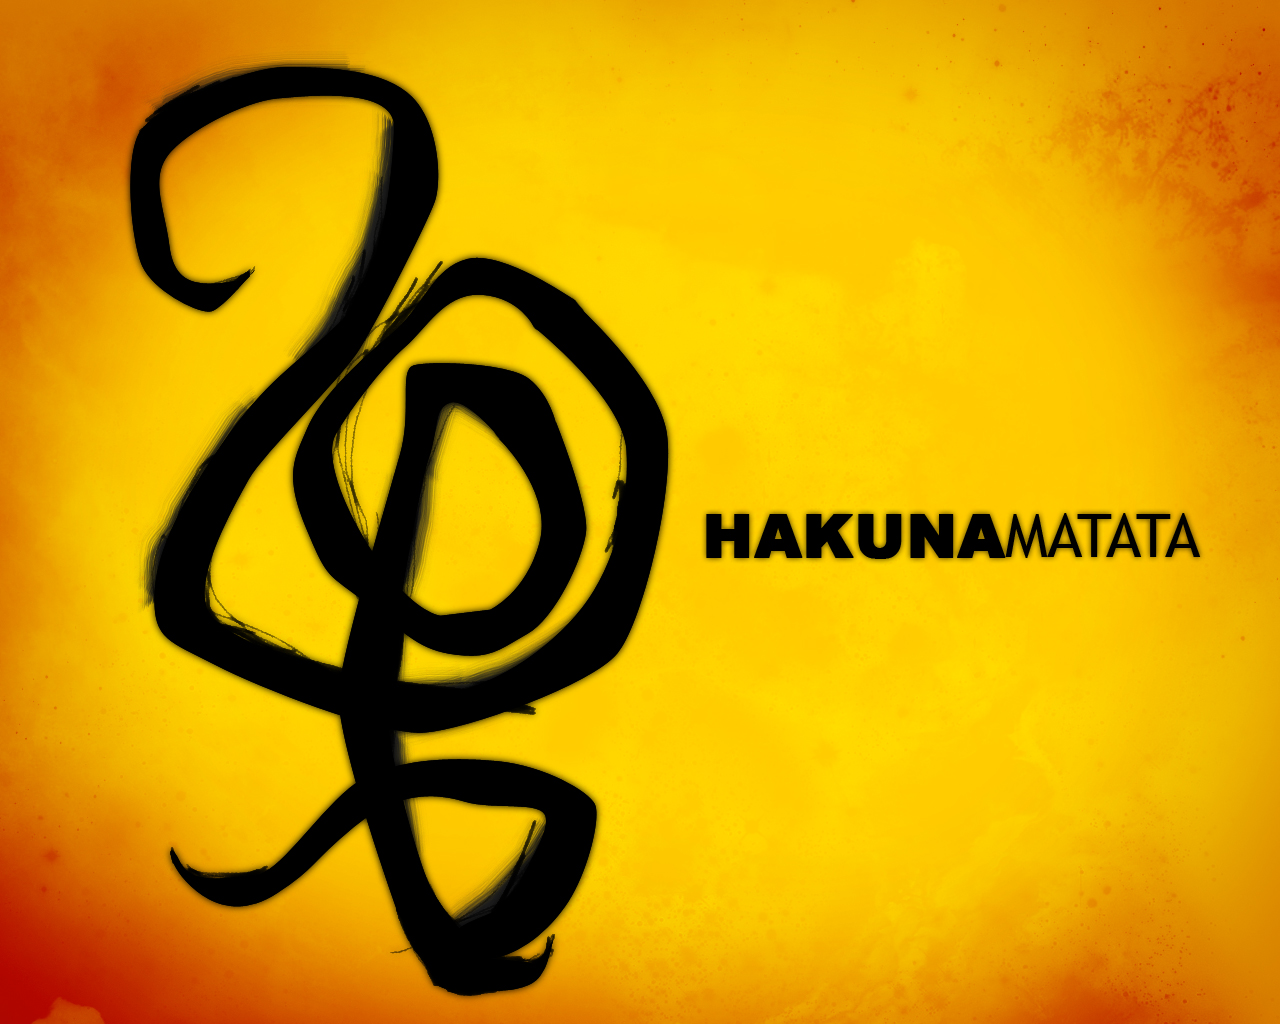 Pin Hakuna Matata Pictures On Pinterest